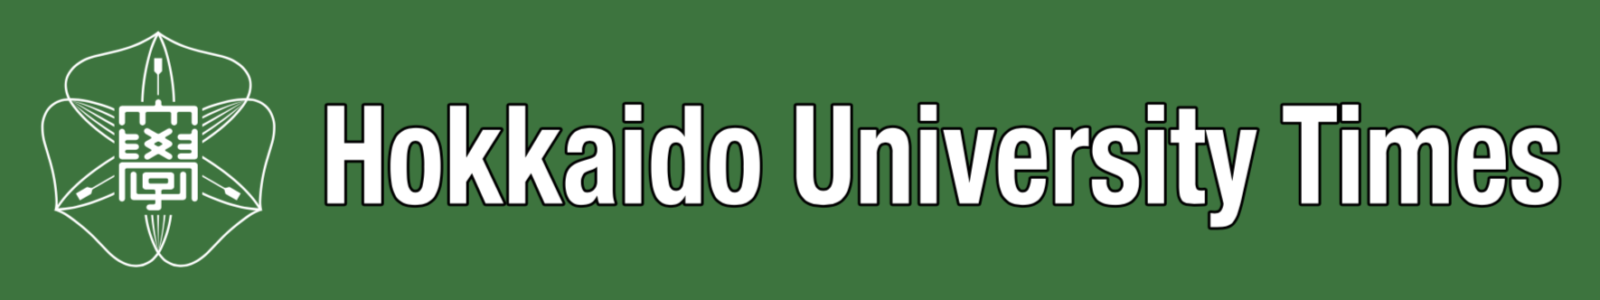 Hokkaido University   Hokkaido University official website